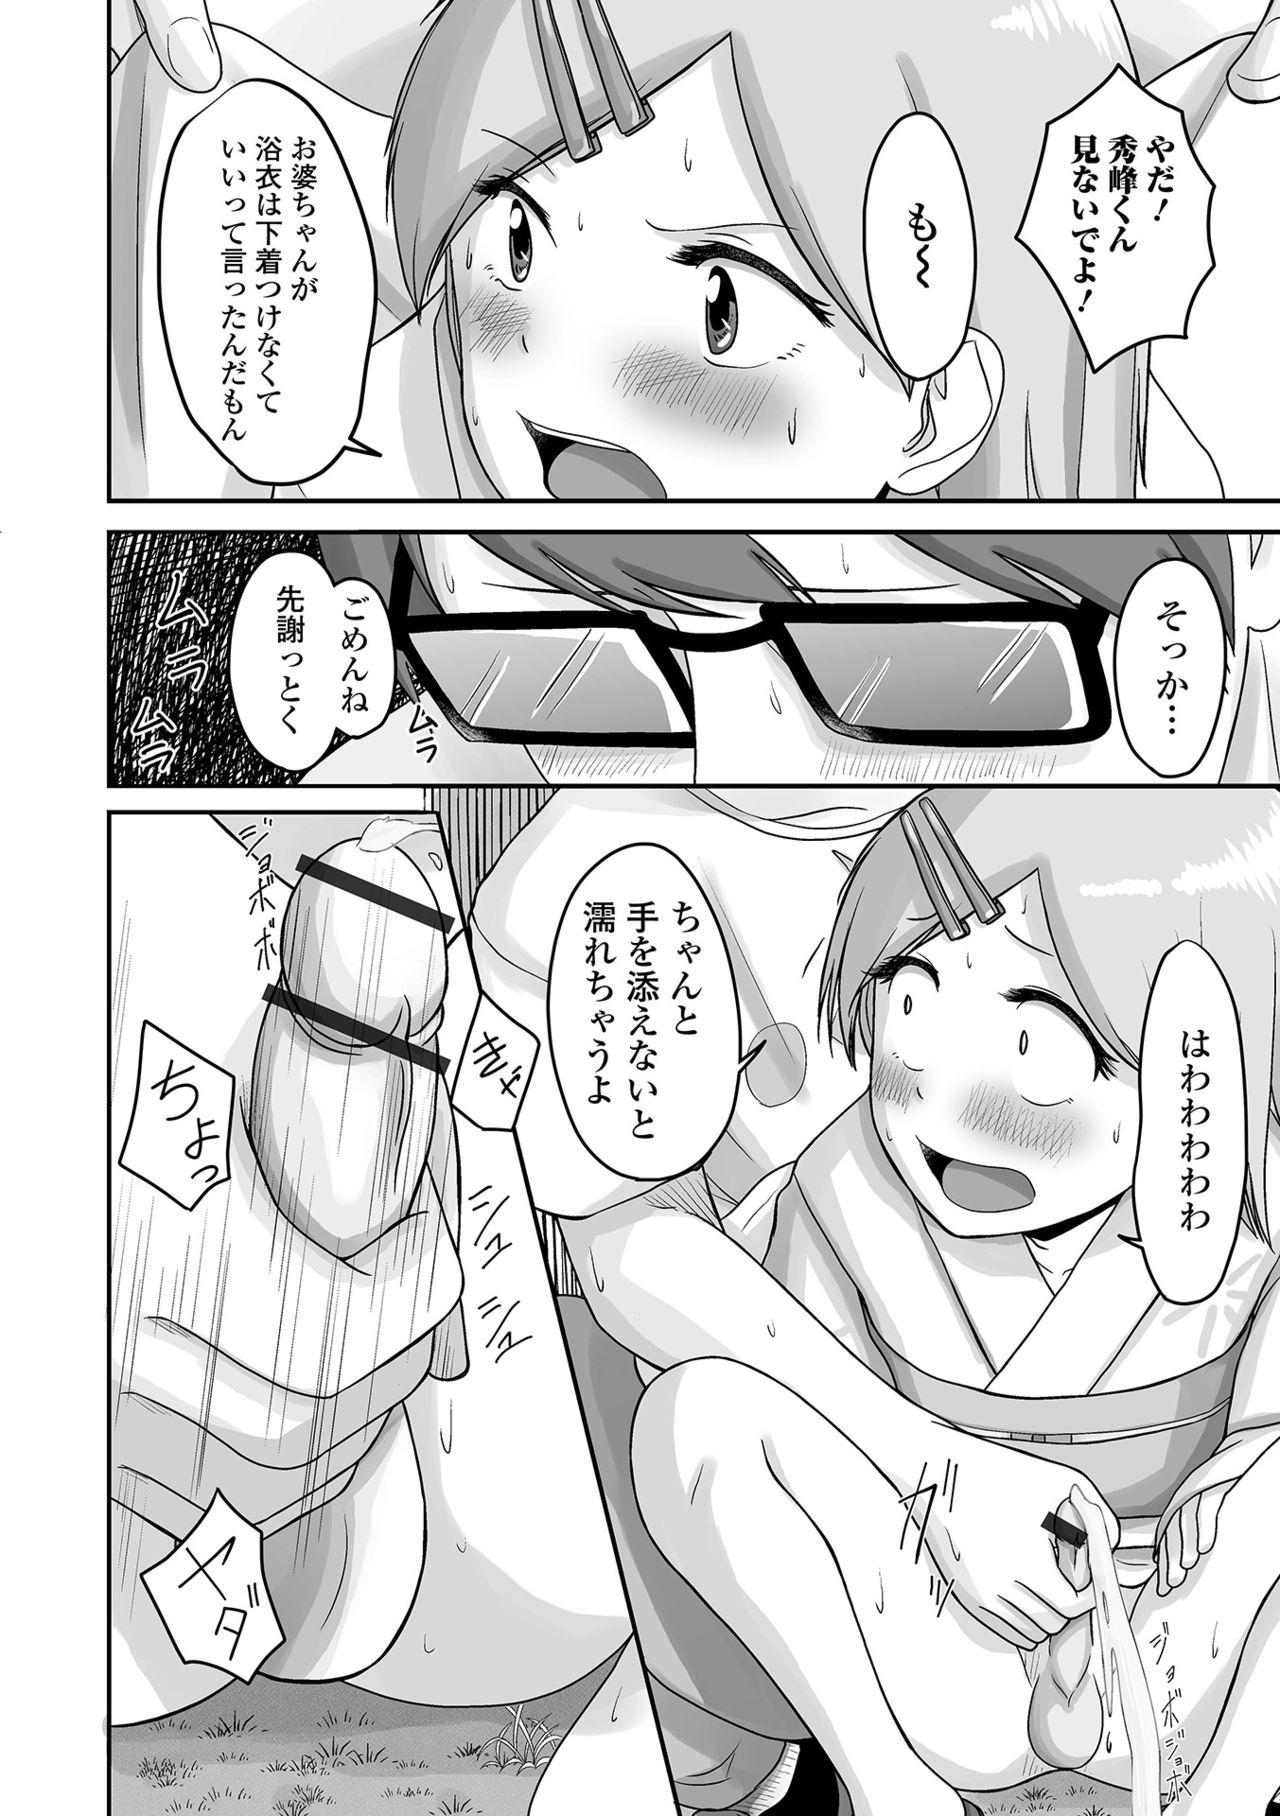 Gekkan Web Otoko no Ko-llection! S Vol. 64 71